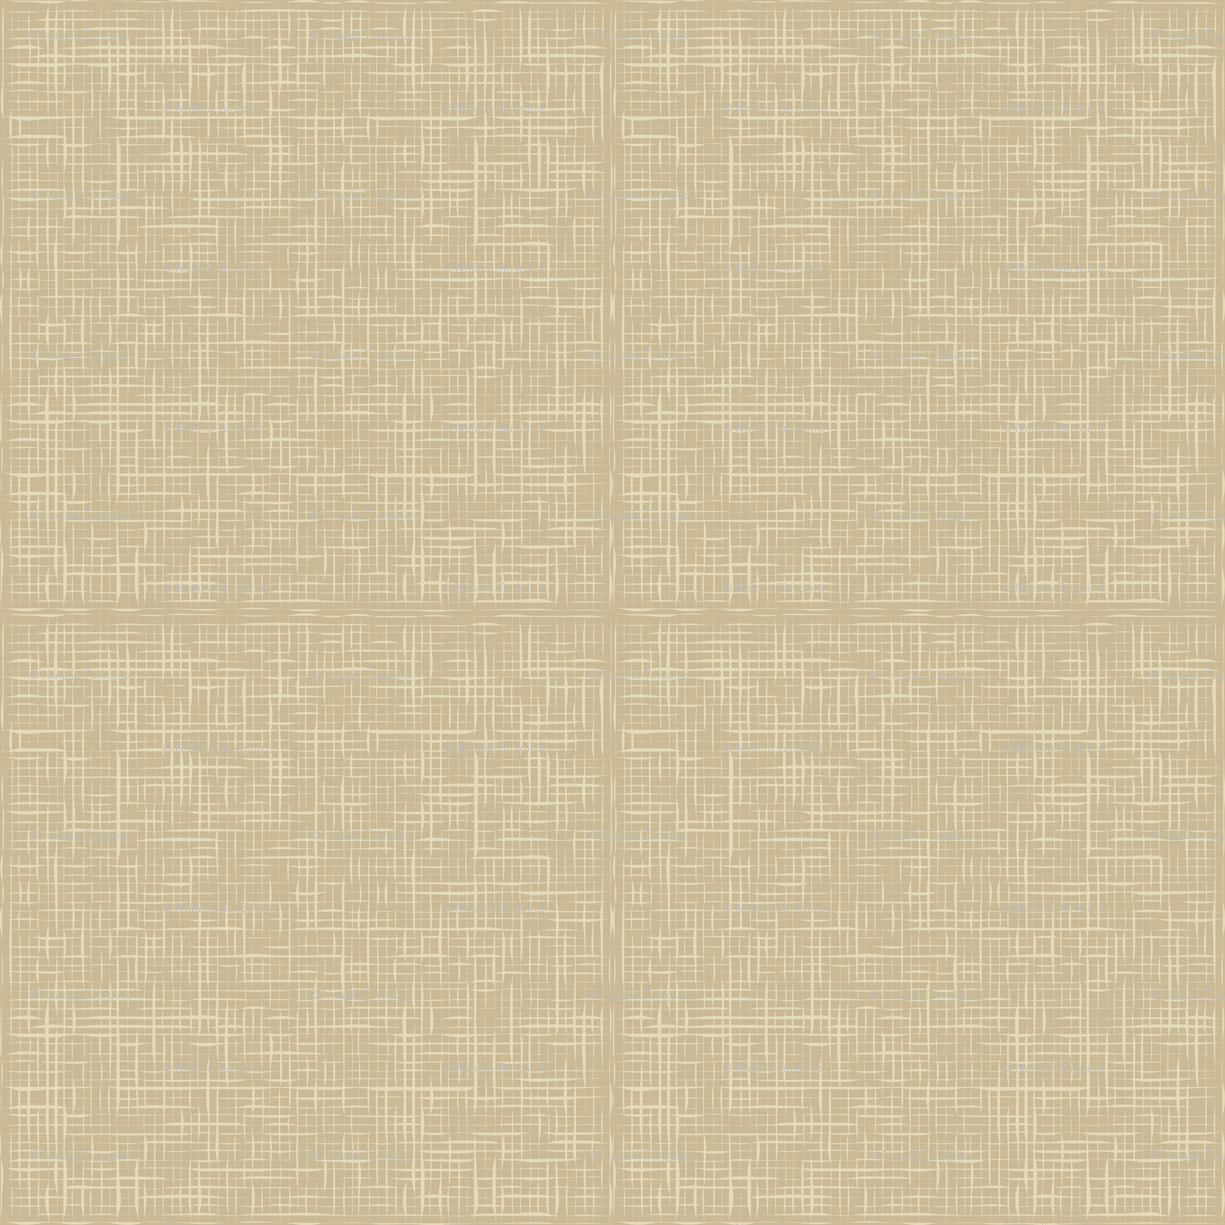 25 cotton linen paper no watermark